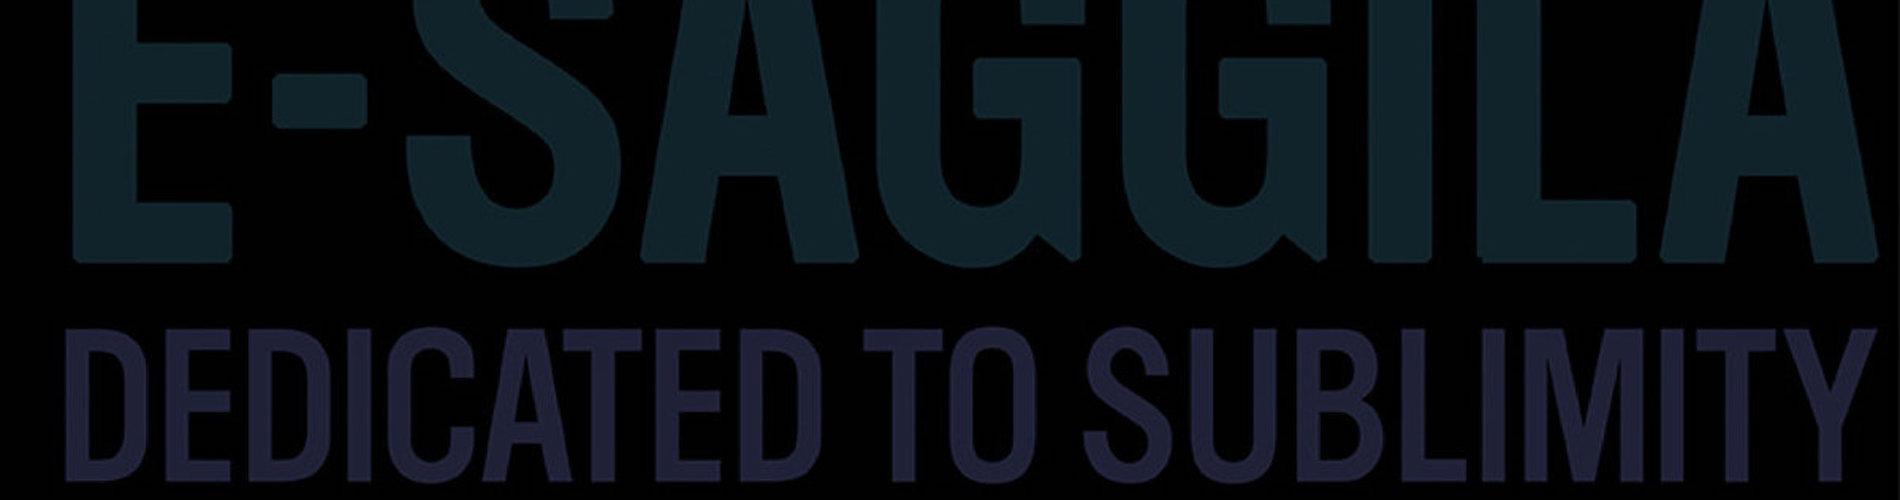 E-SAGGILA-Dedicated-To-Sublimity-Banner